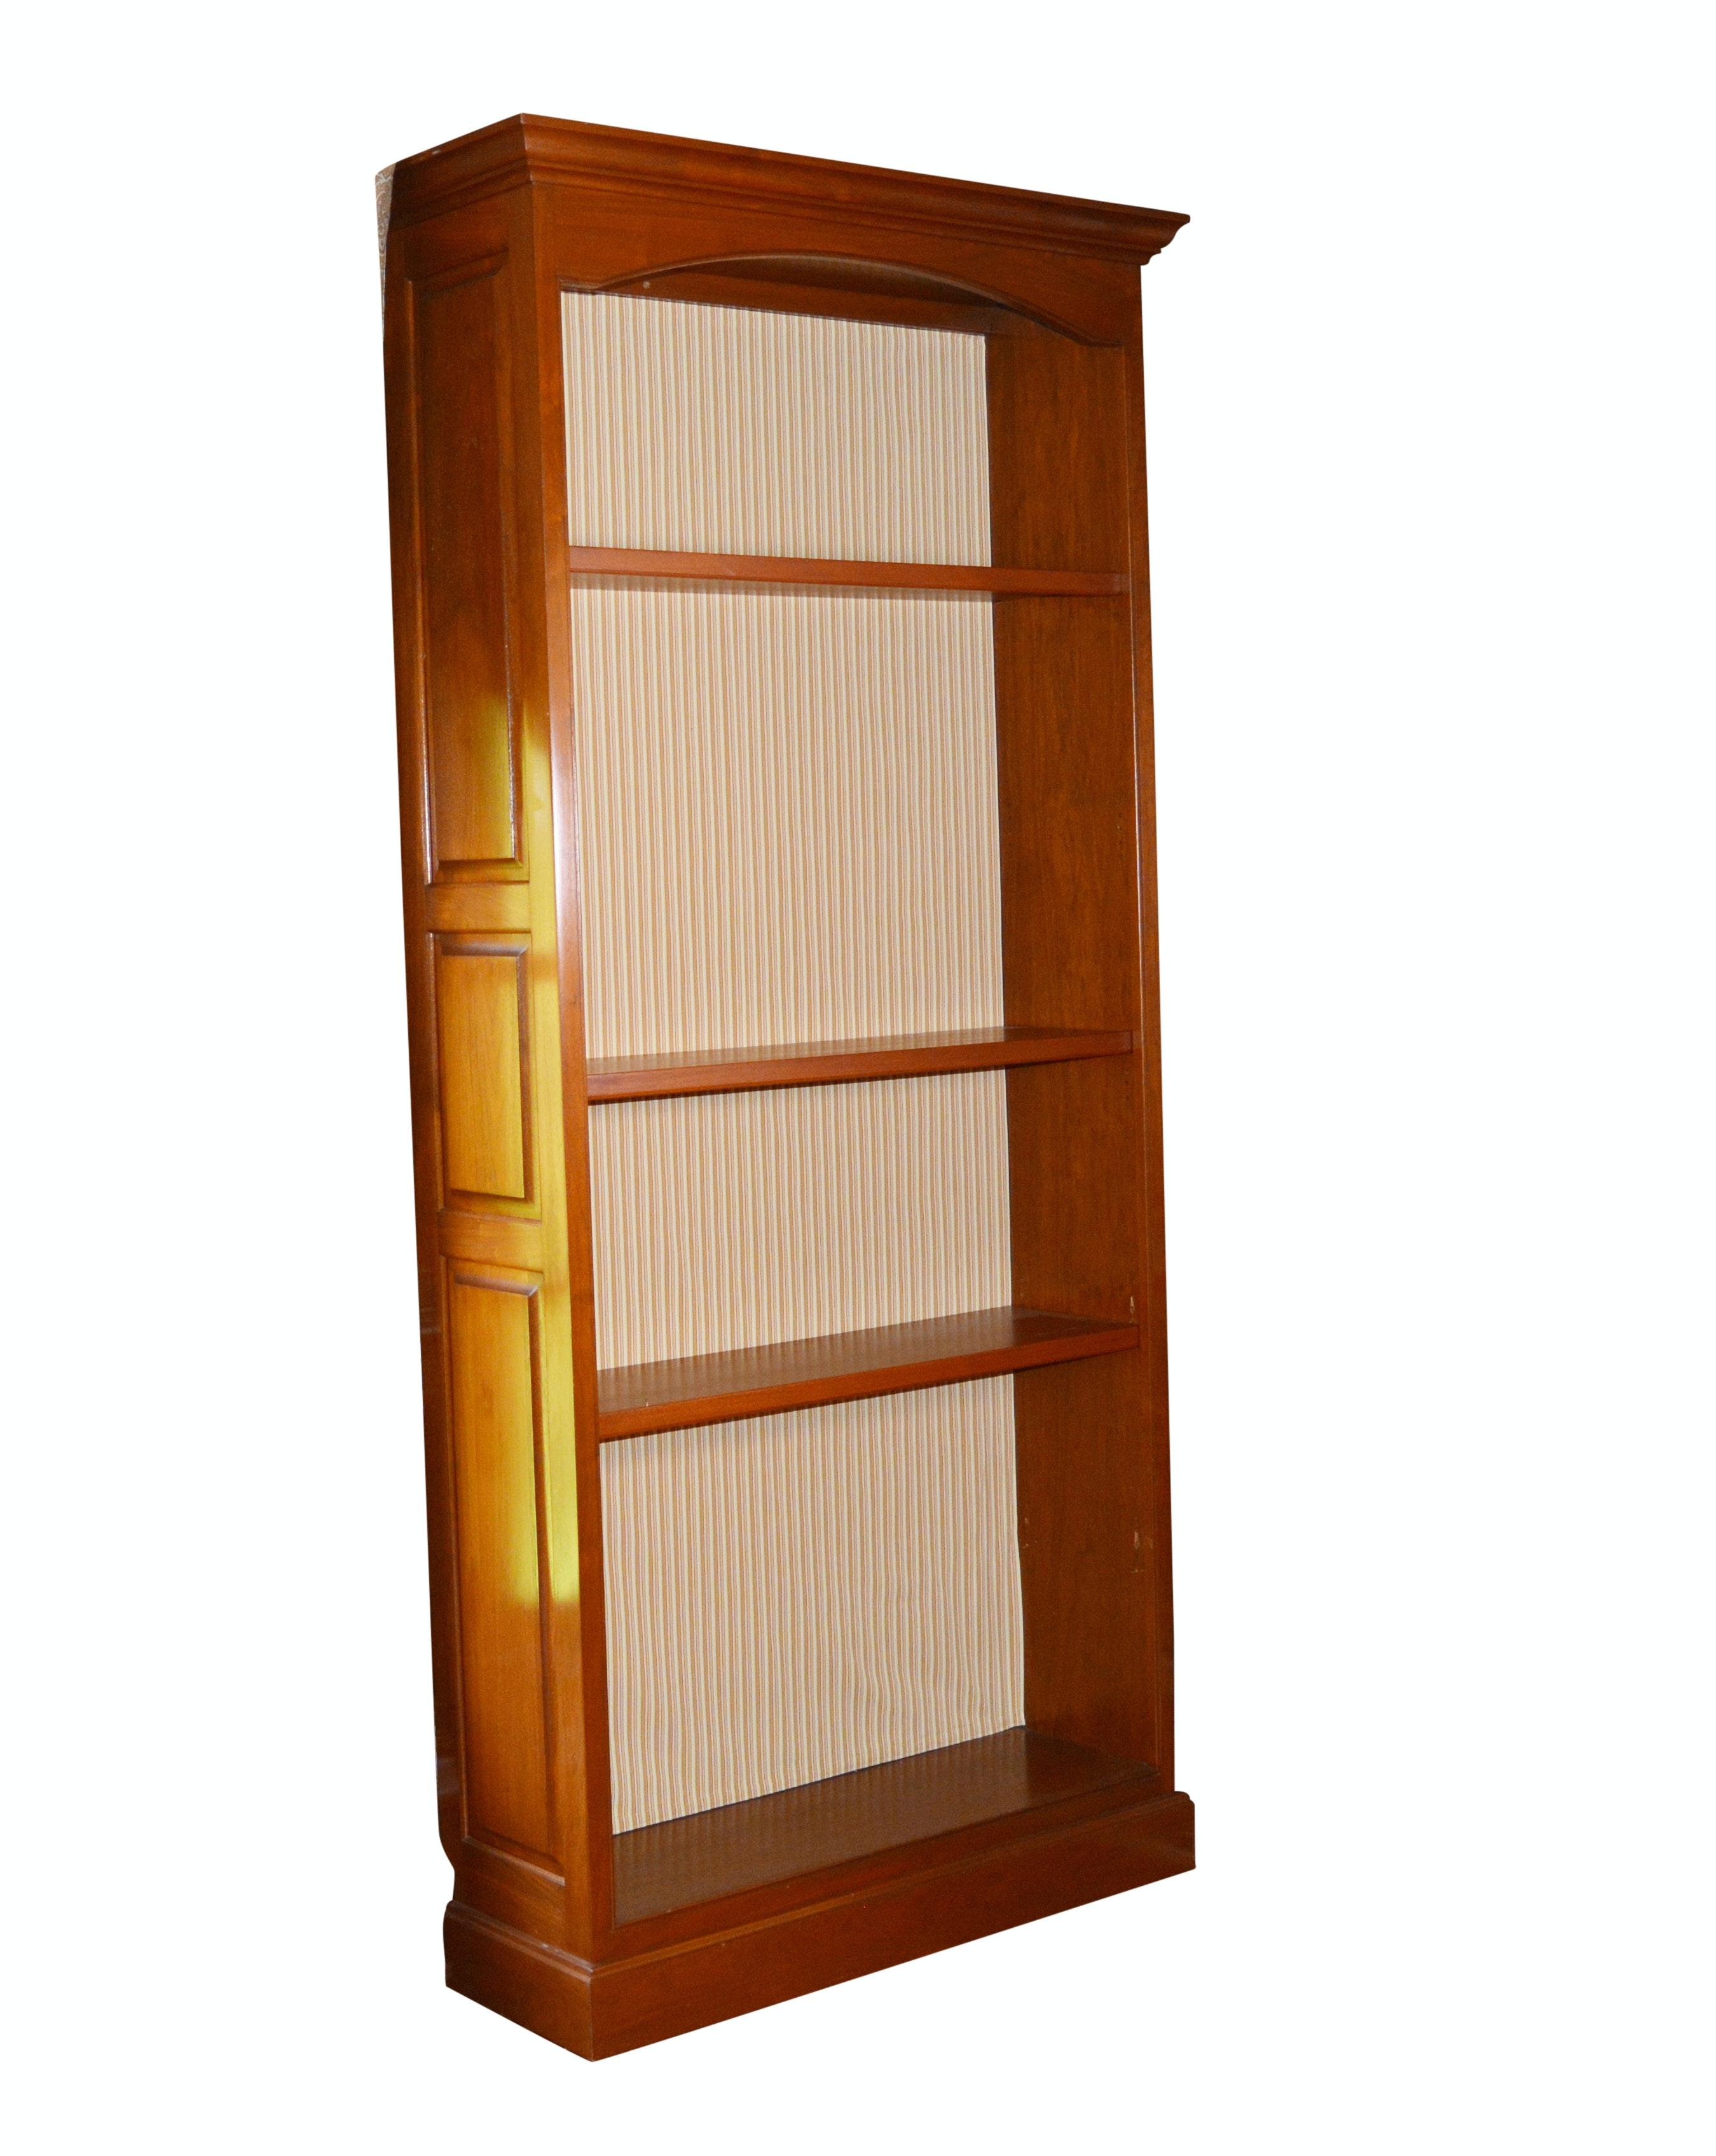 Contemporary Wood Three-Shelf Bookcase